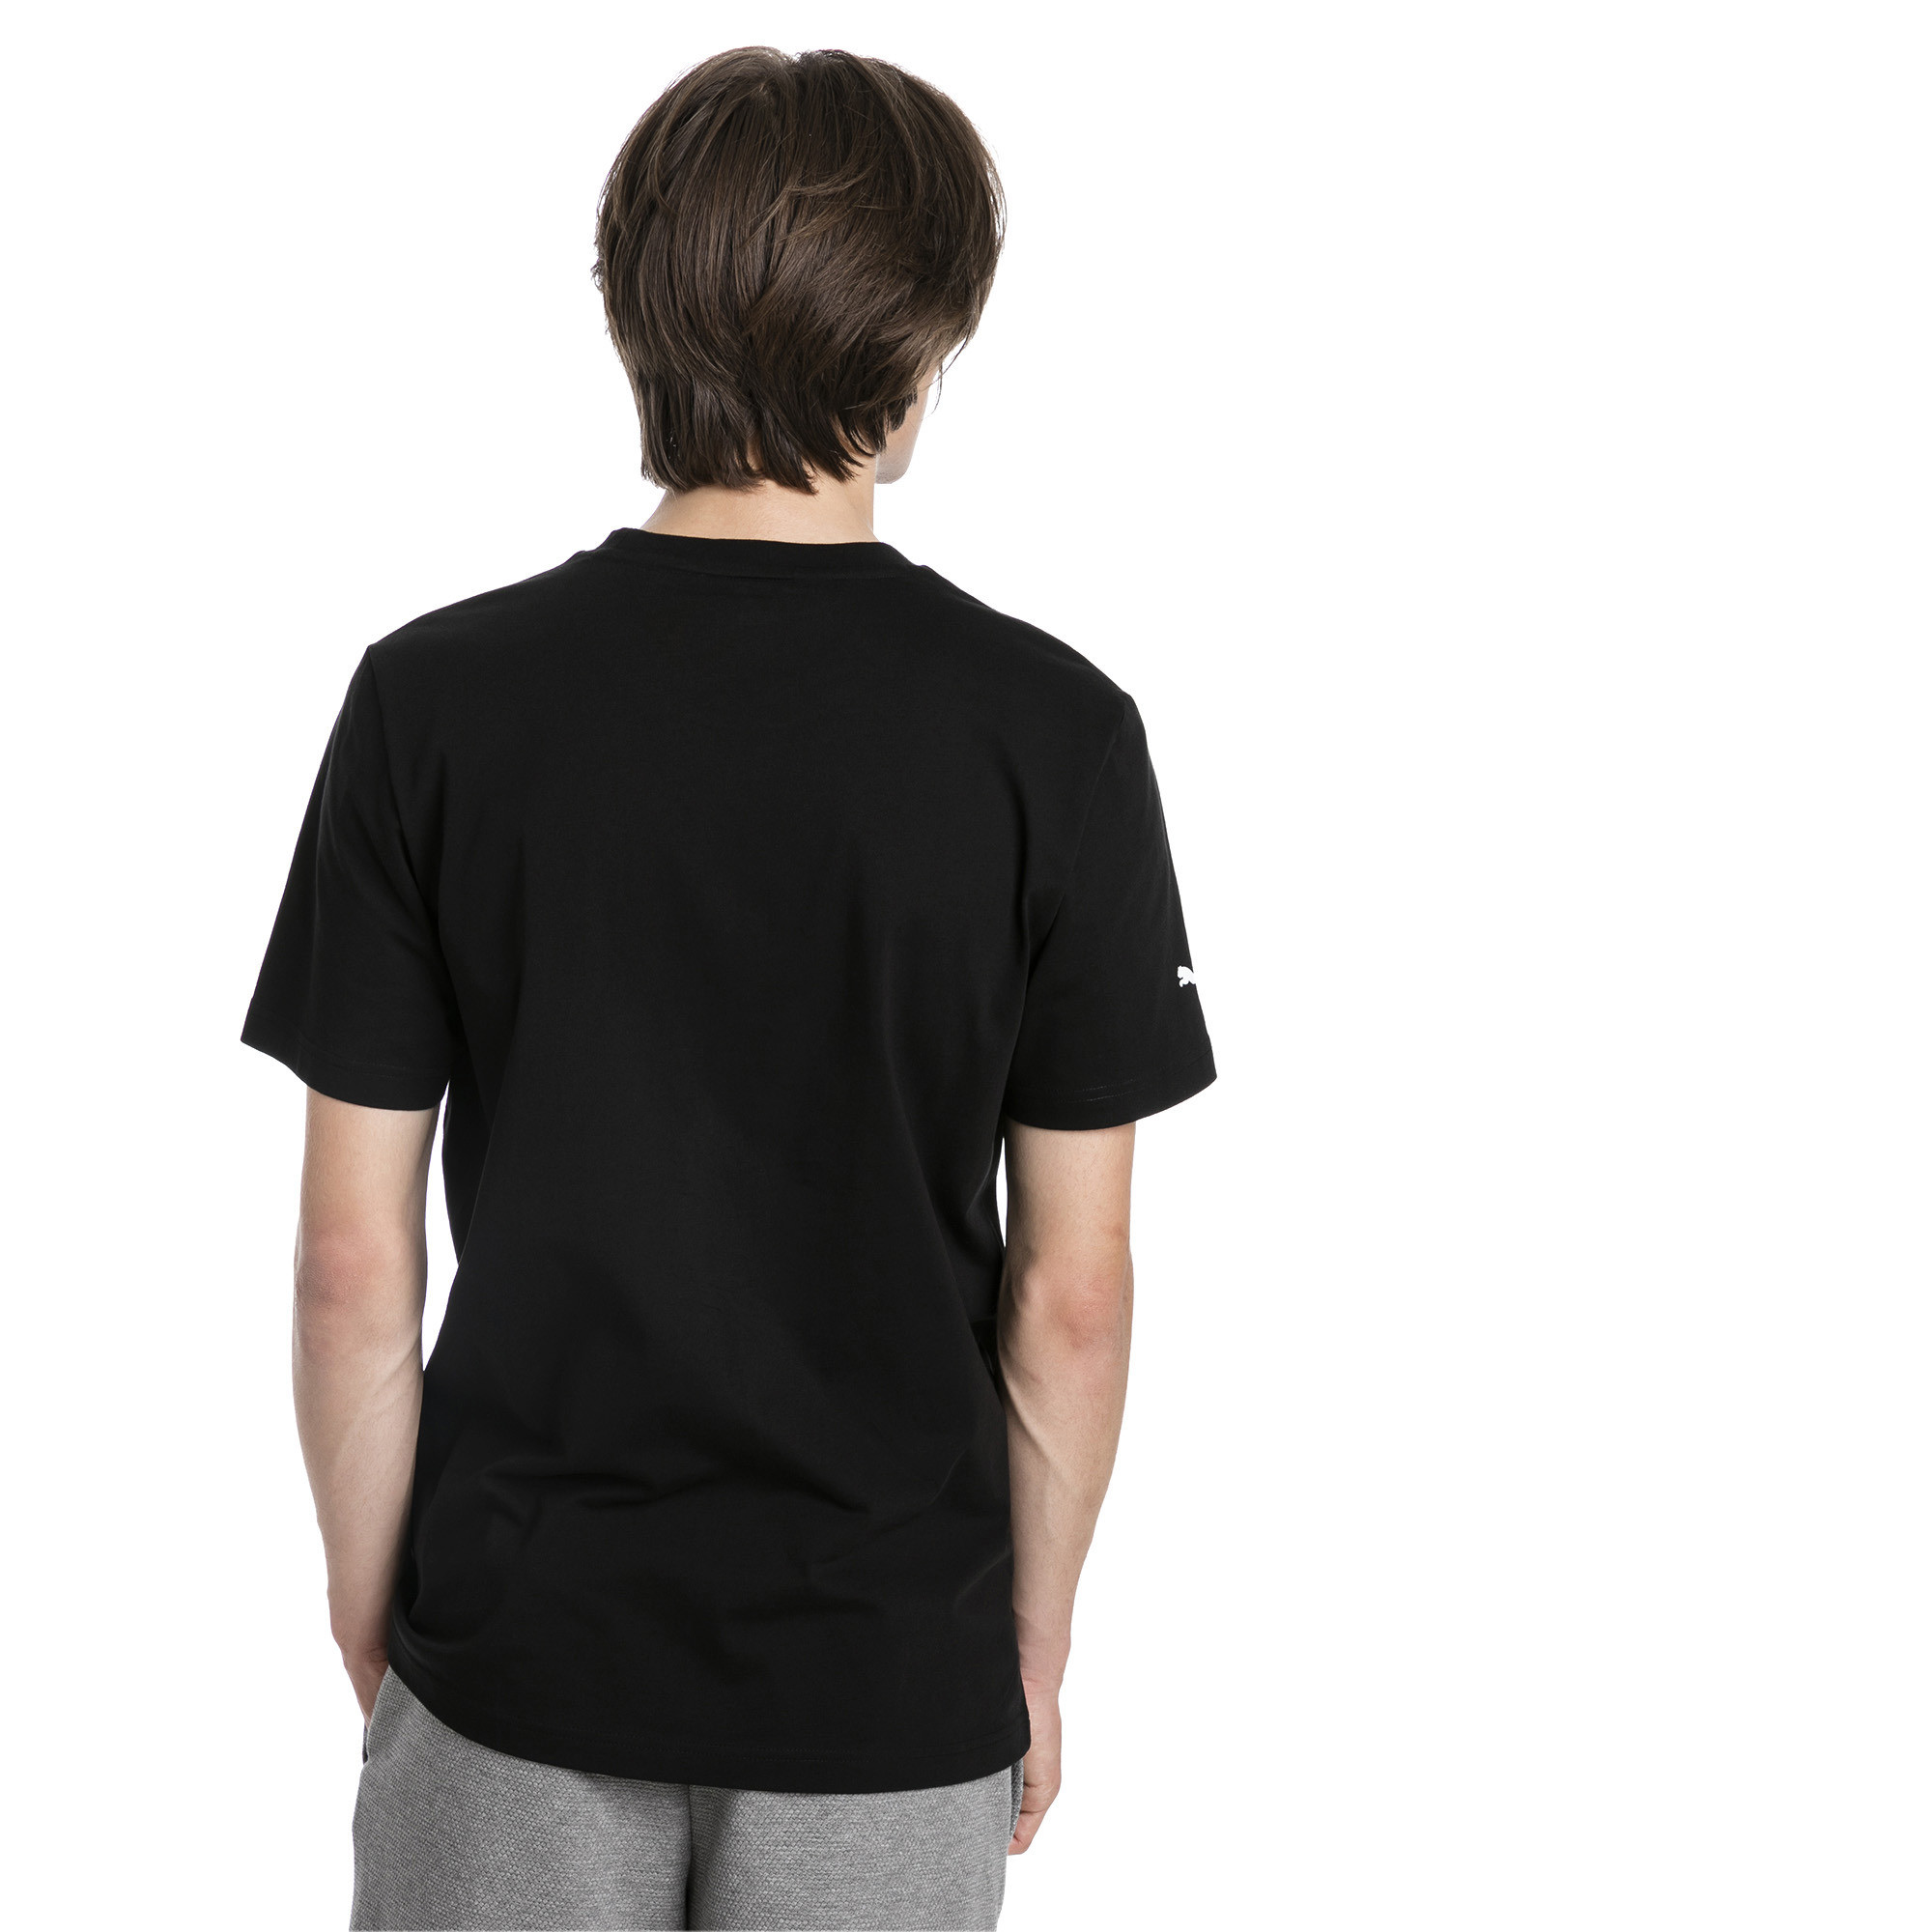 PUMA-BMW-M-Motorsport-Logo-Herren-T-Shirt-Maenner-T-Shirt-Neu Indexbild 5